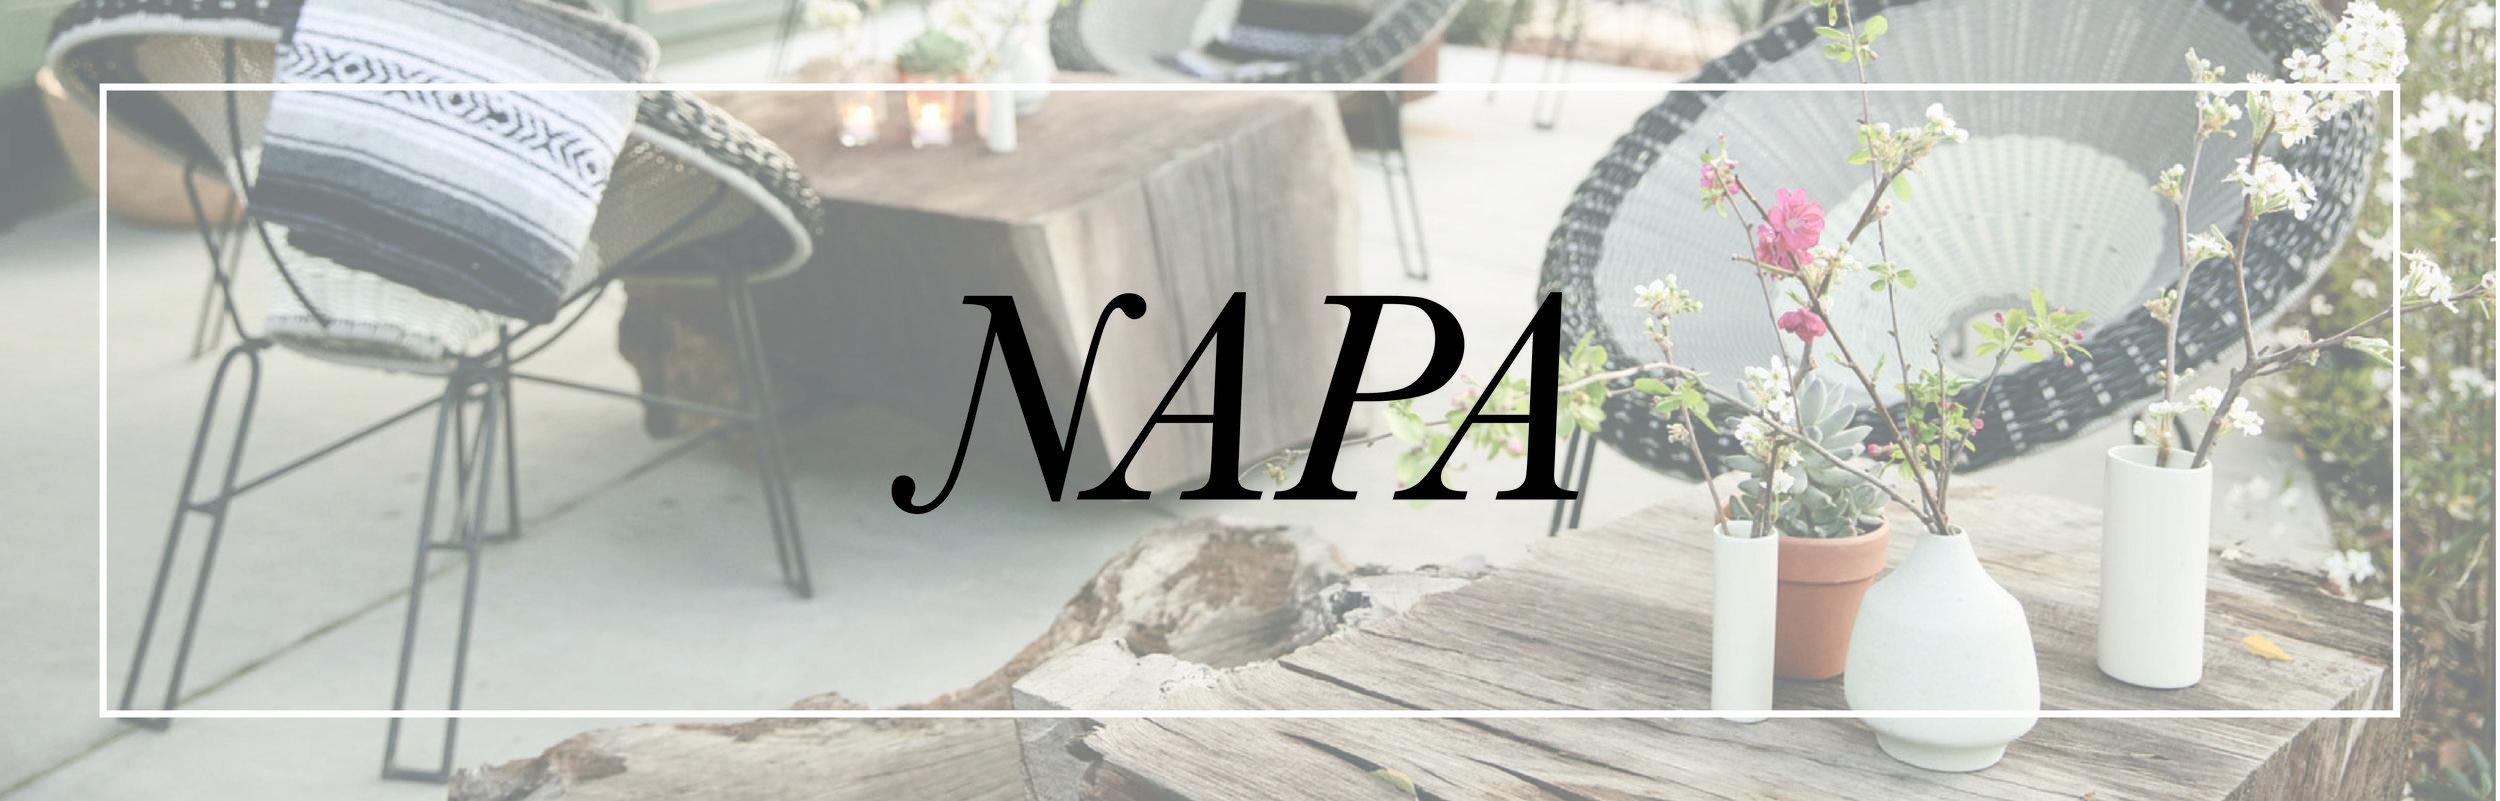 napa-01.jpg